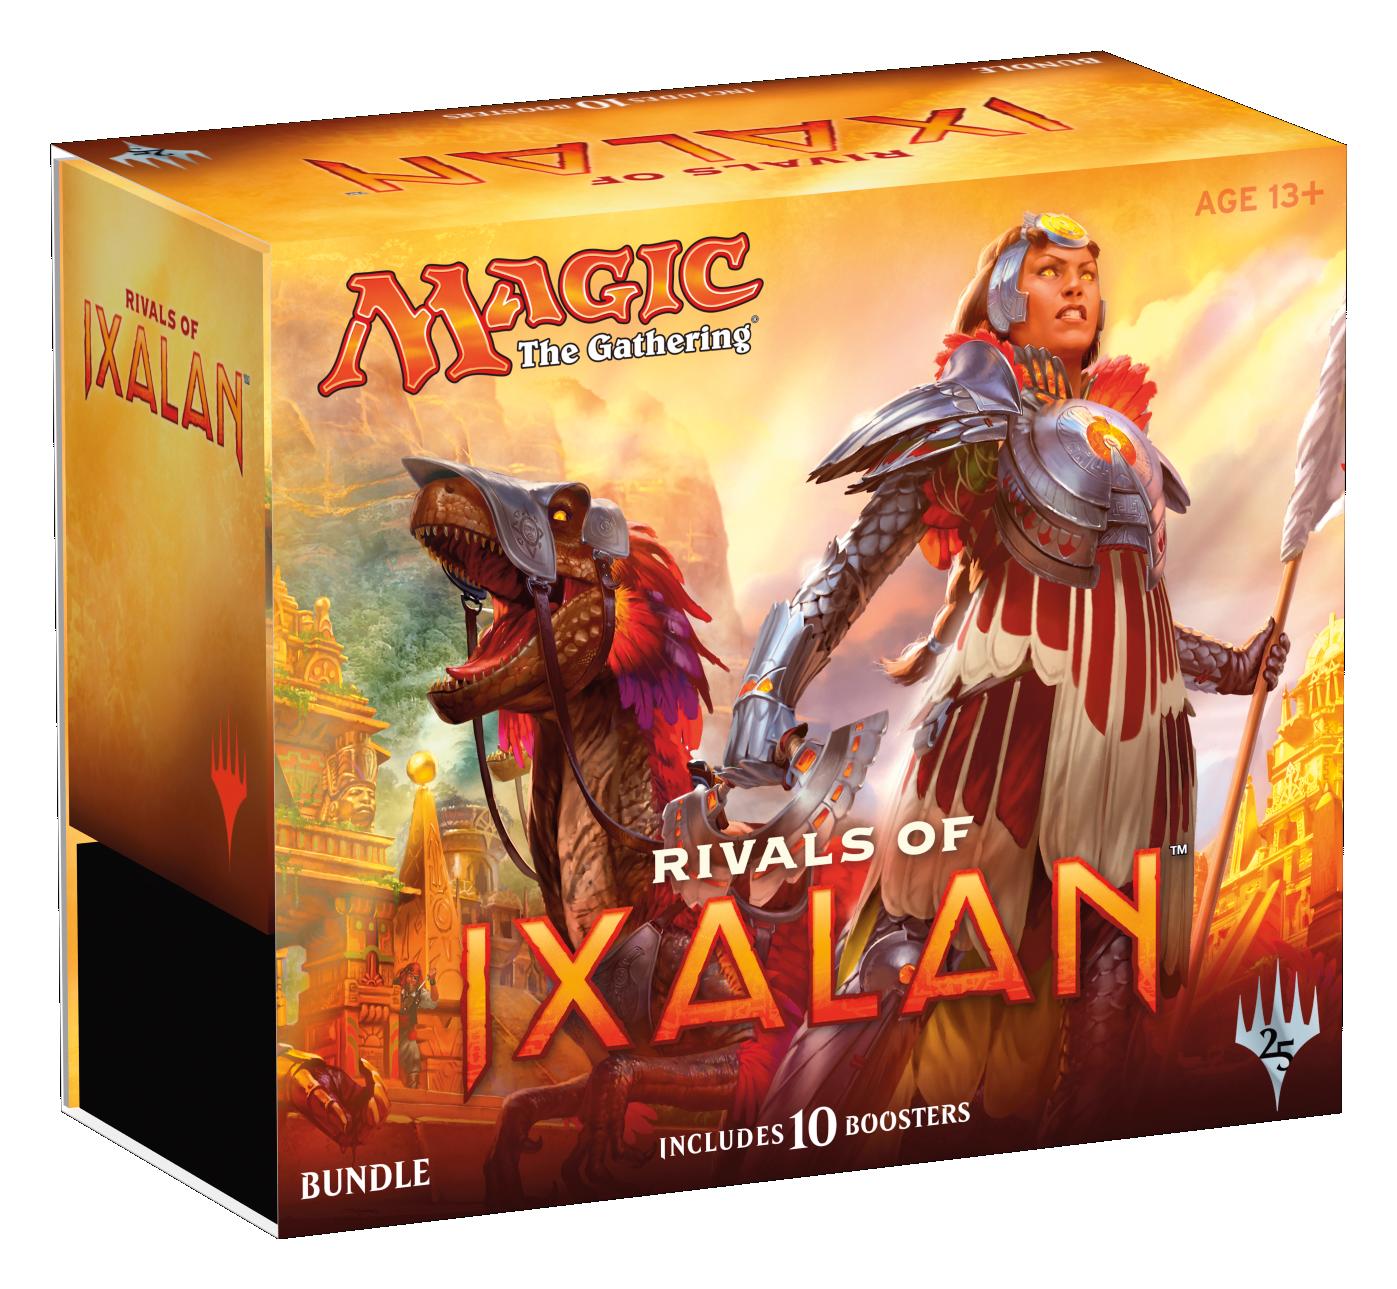 Magic: The Gathering - Rivals of Ixalan bundle